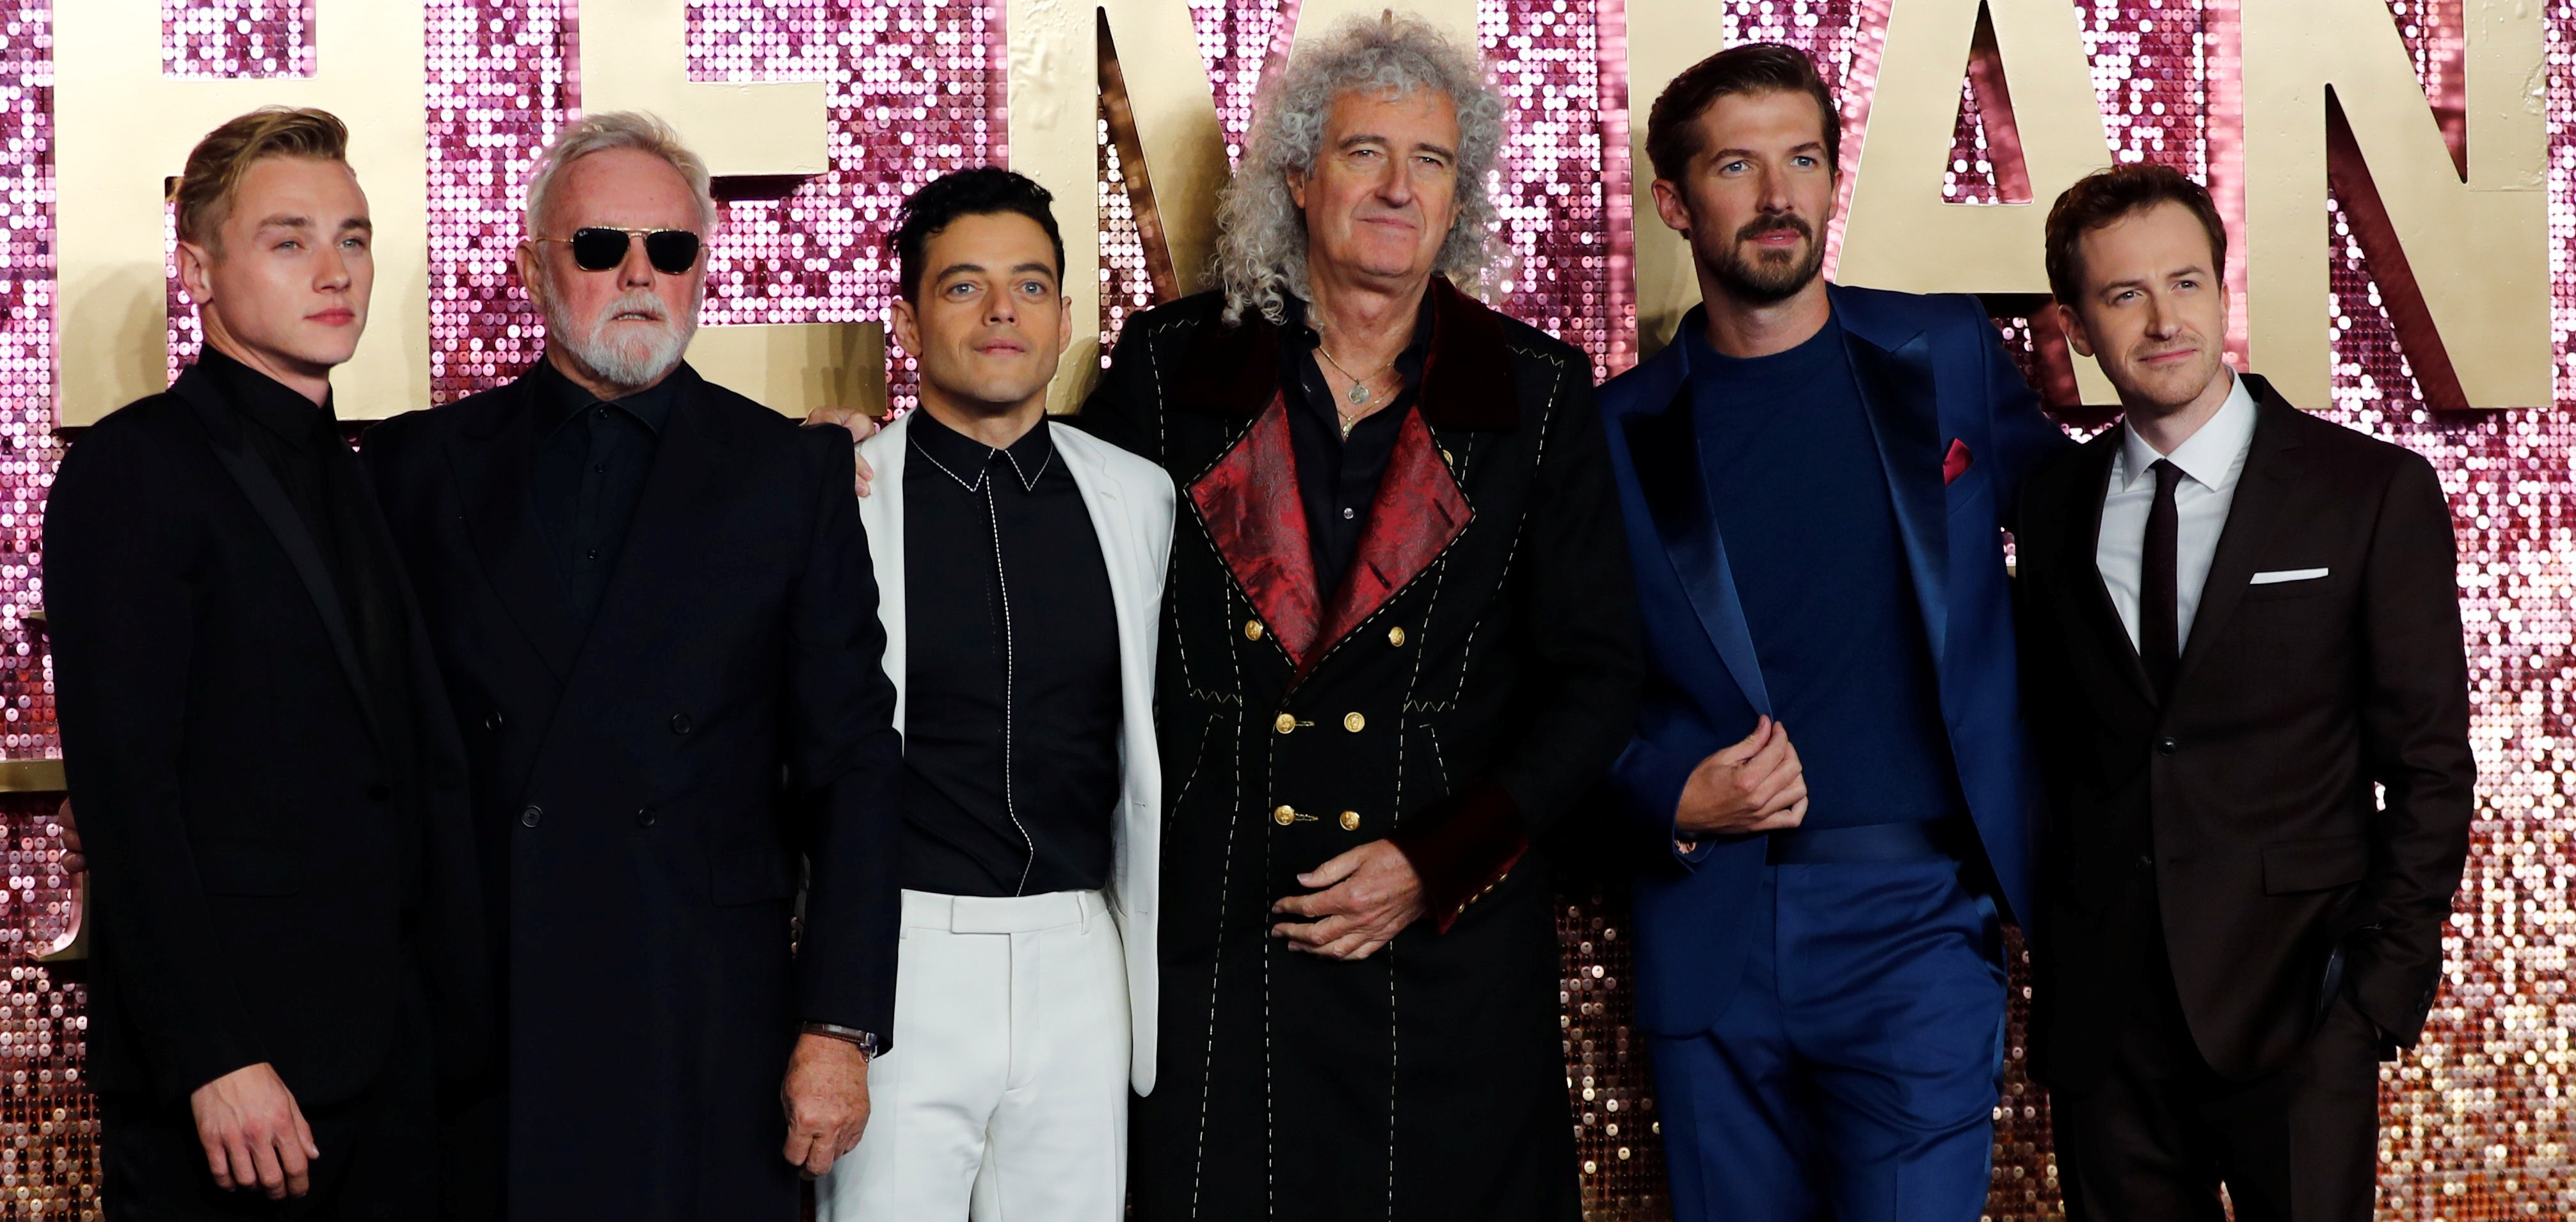 'Bohemian Rhapsody' movie world premiere